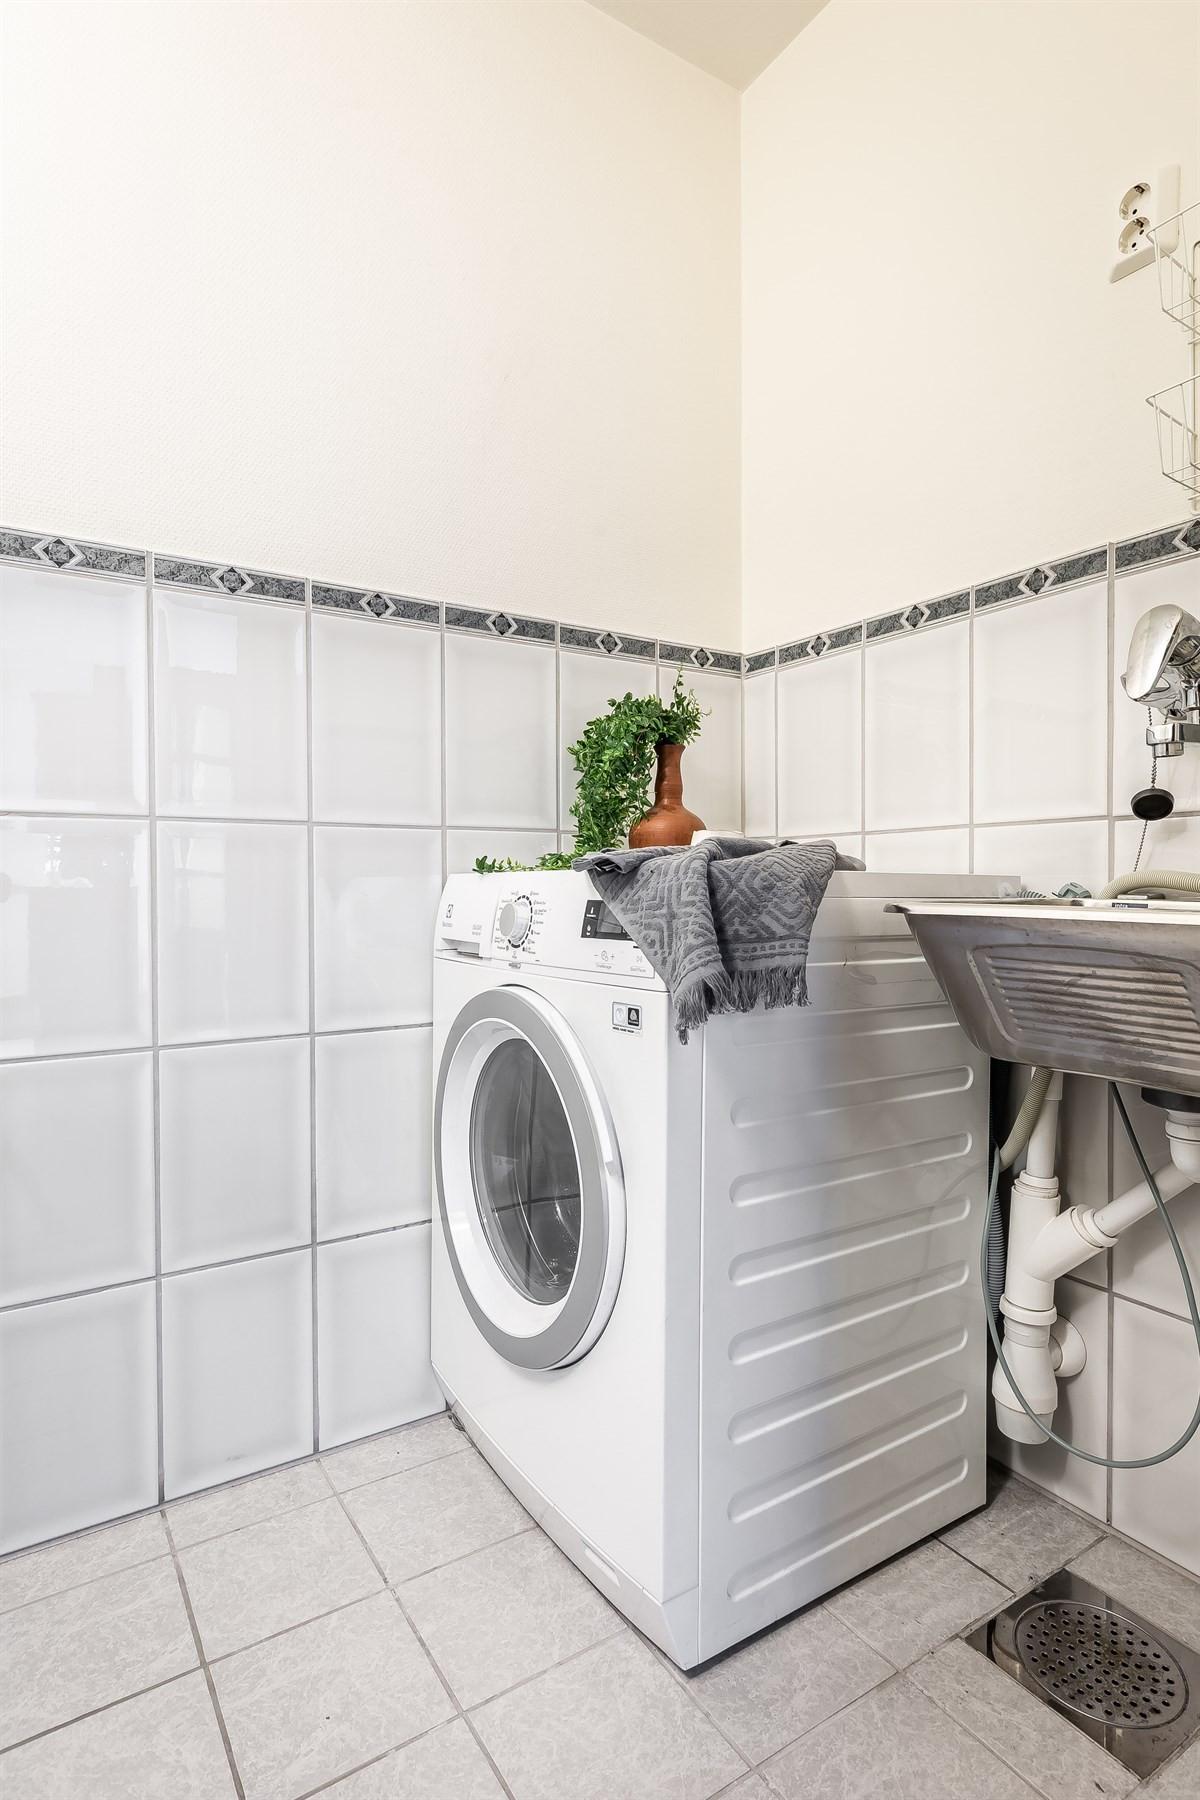 Her er det god plass til vask/tørk og øvrig oppbevaring